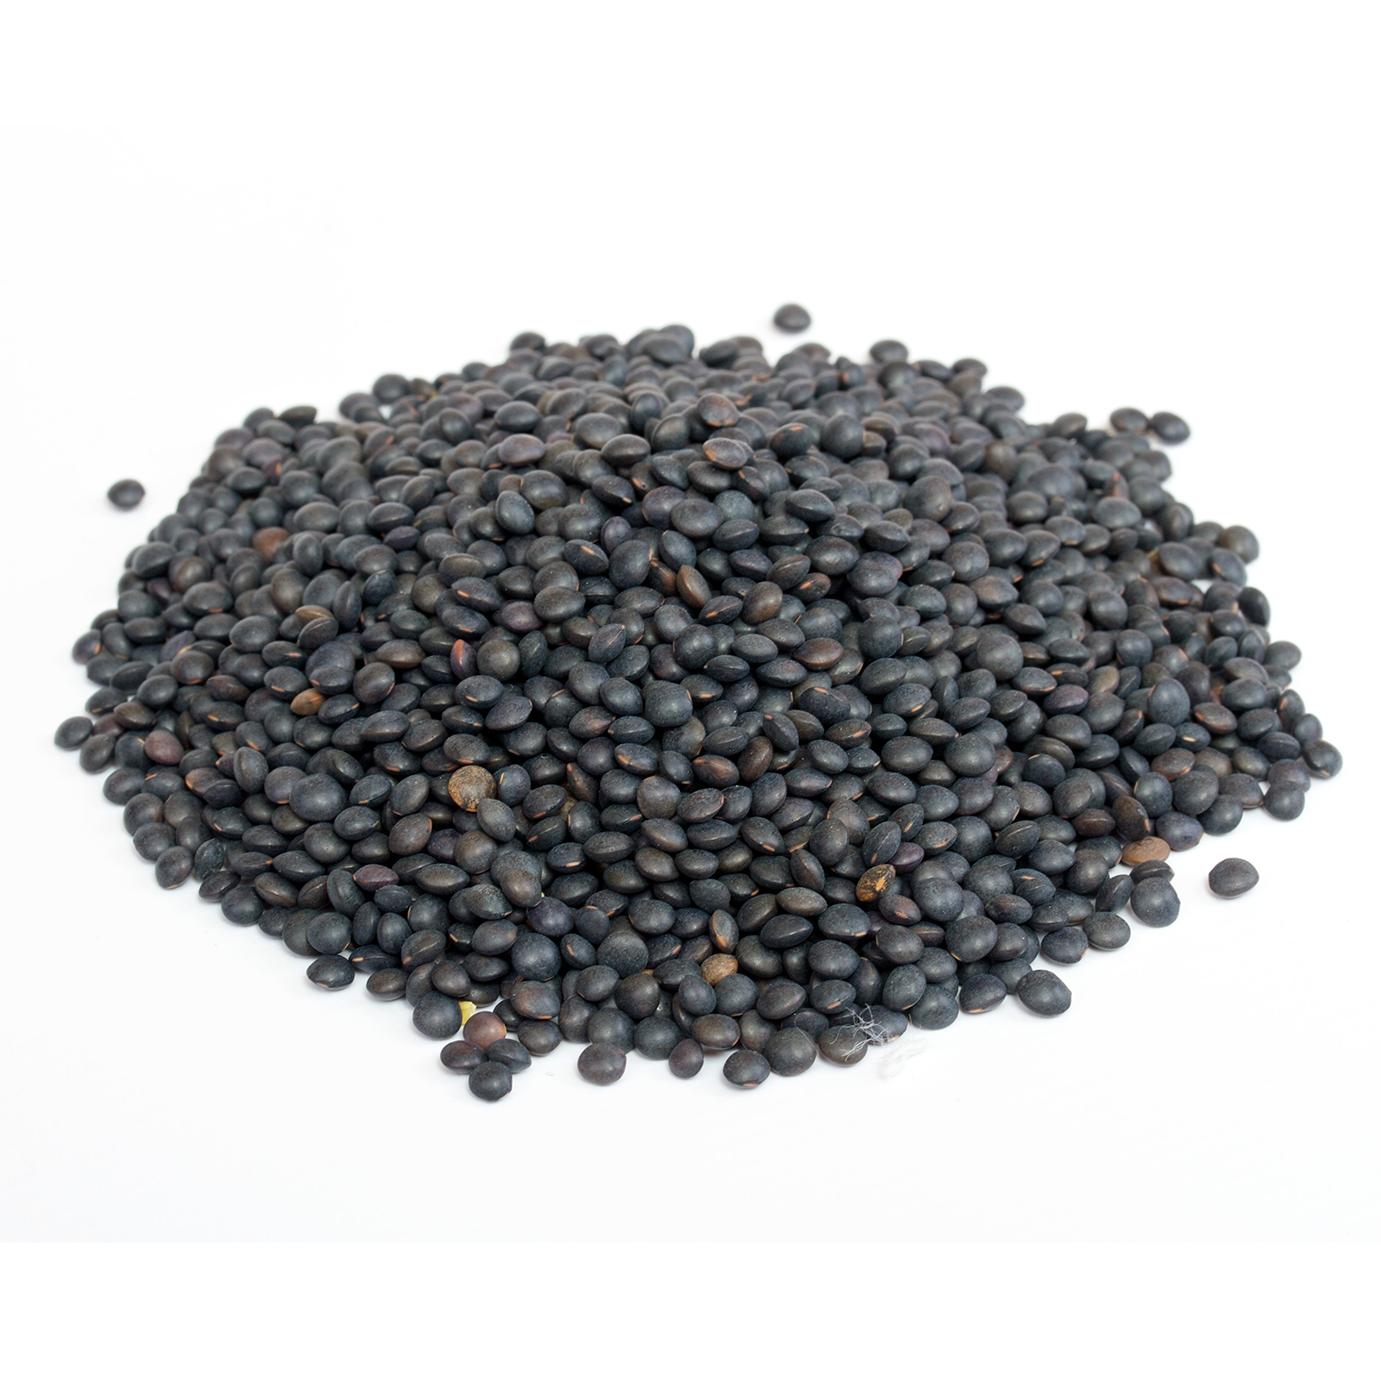 Black Lentils (Urid Beans)